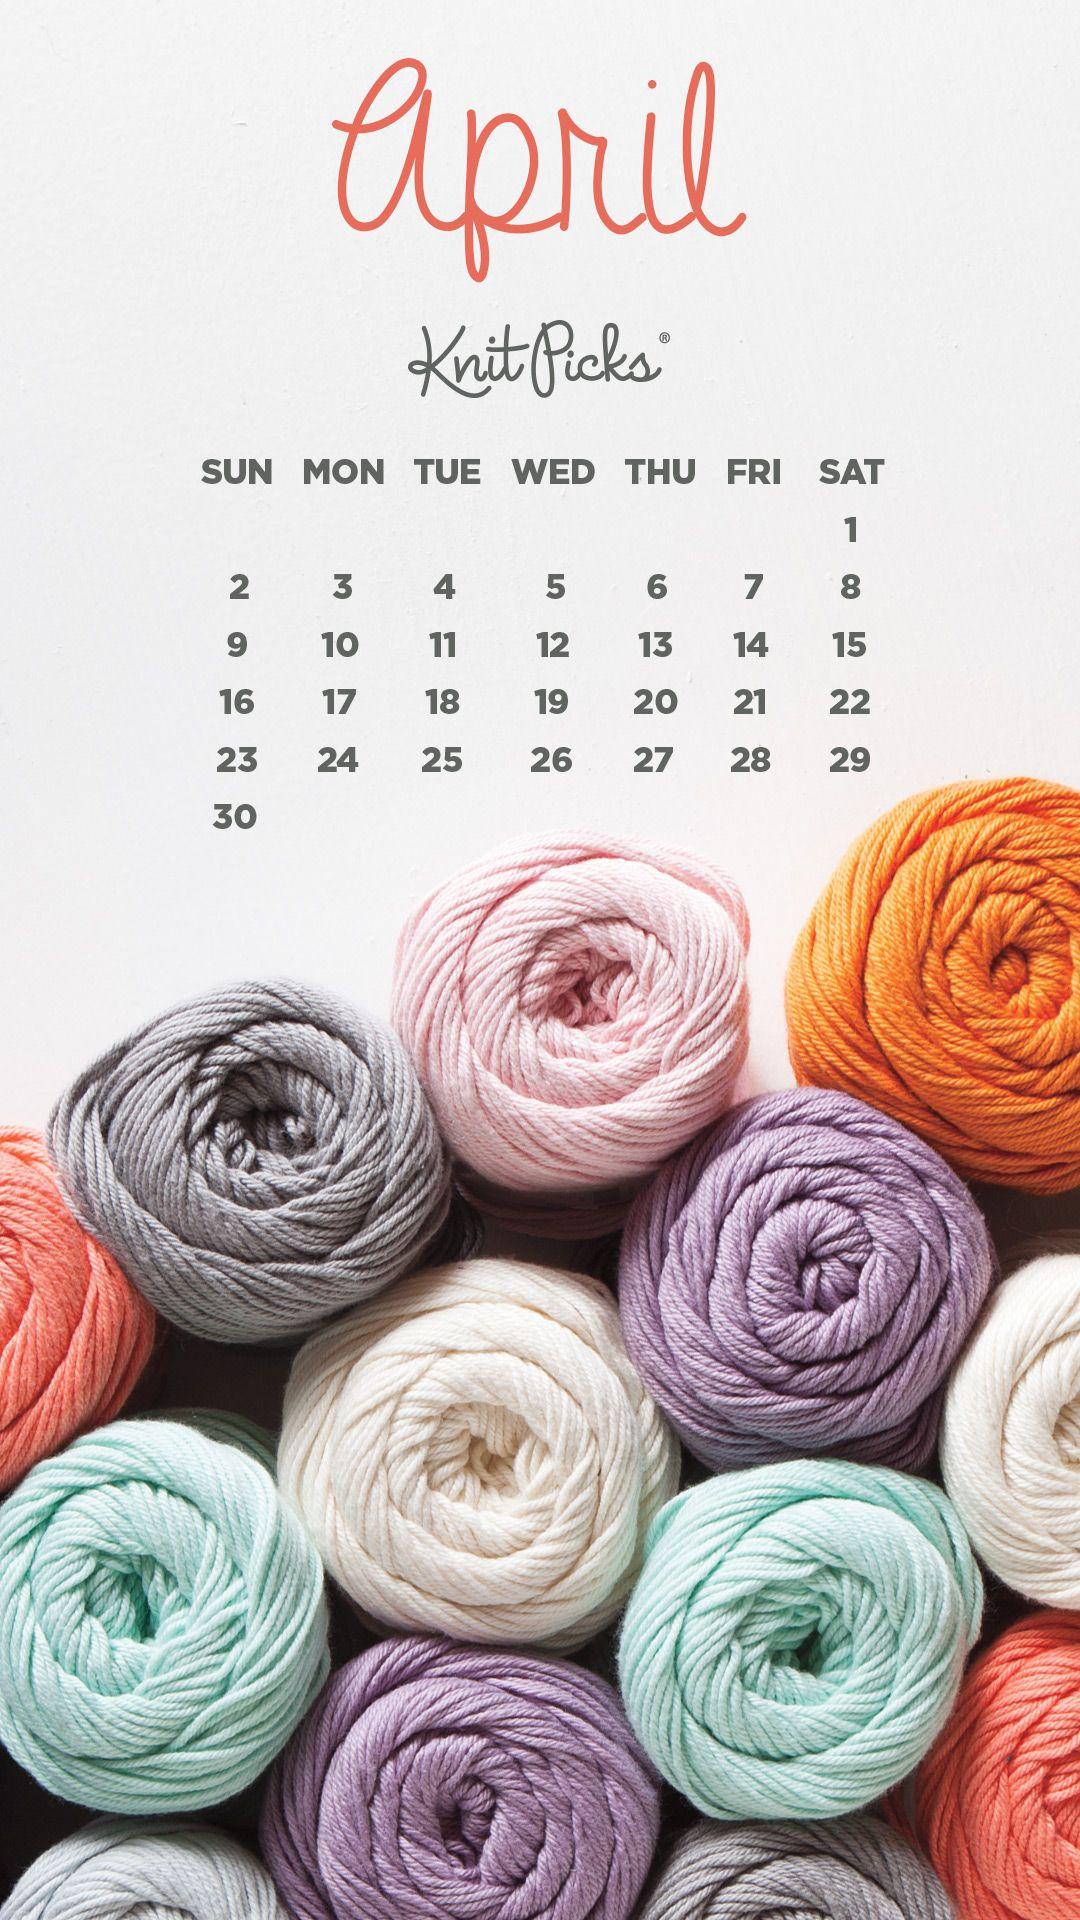 Free Downloadable April Calendar Knitpicks Staff Knitting Blog Knit Picks Yarn Knitting Blogs Knit Picks